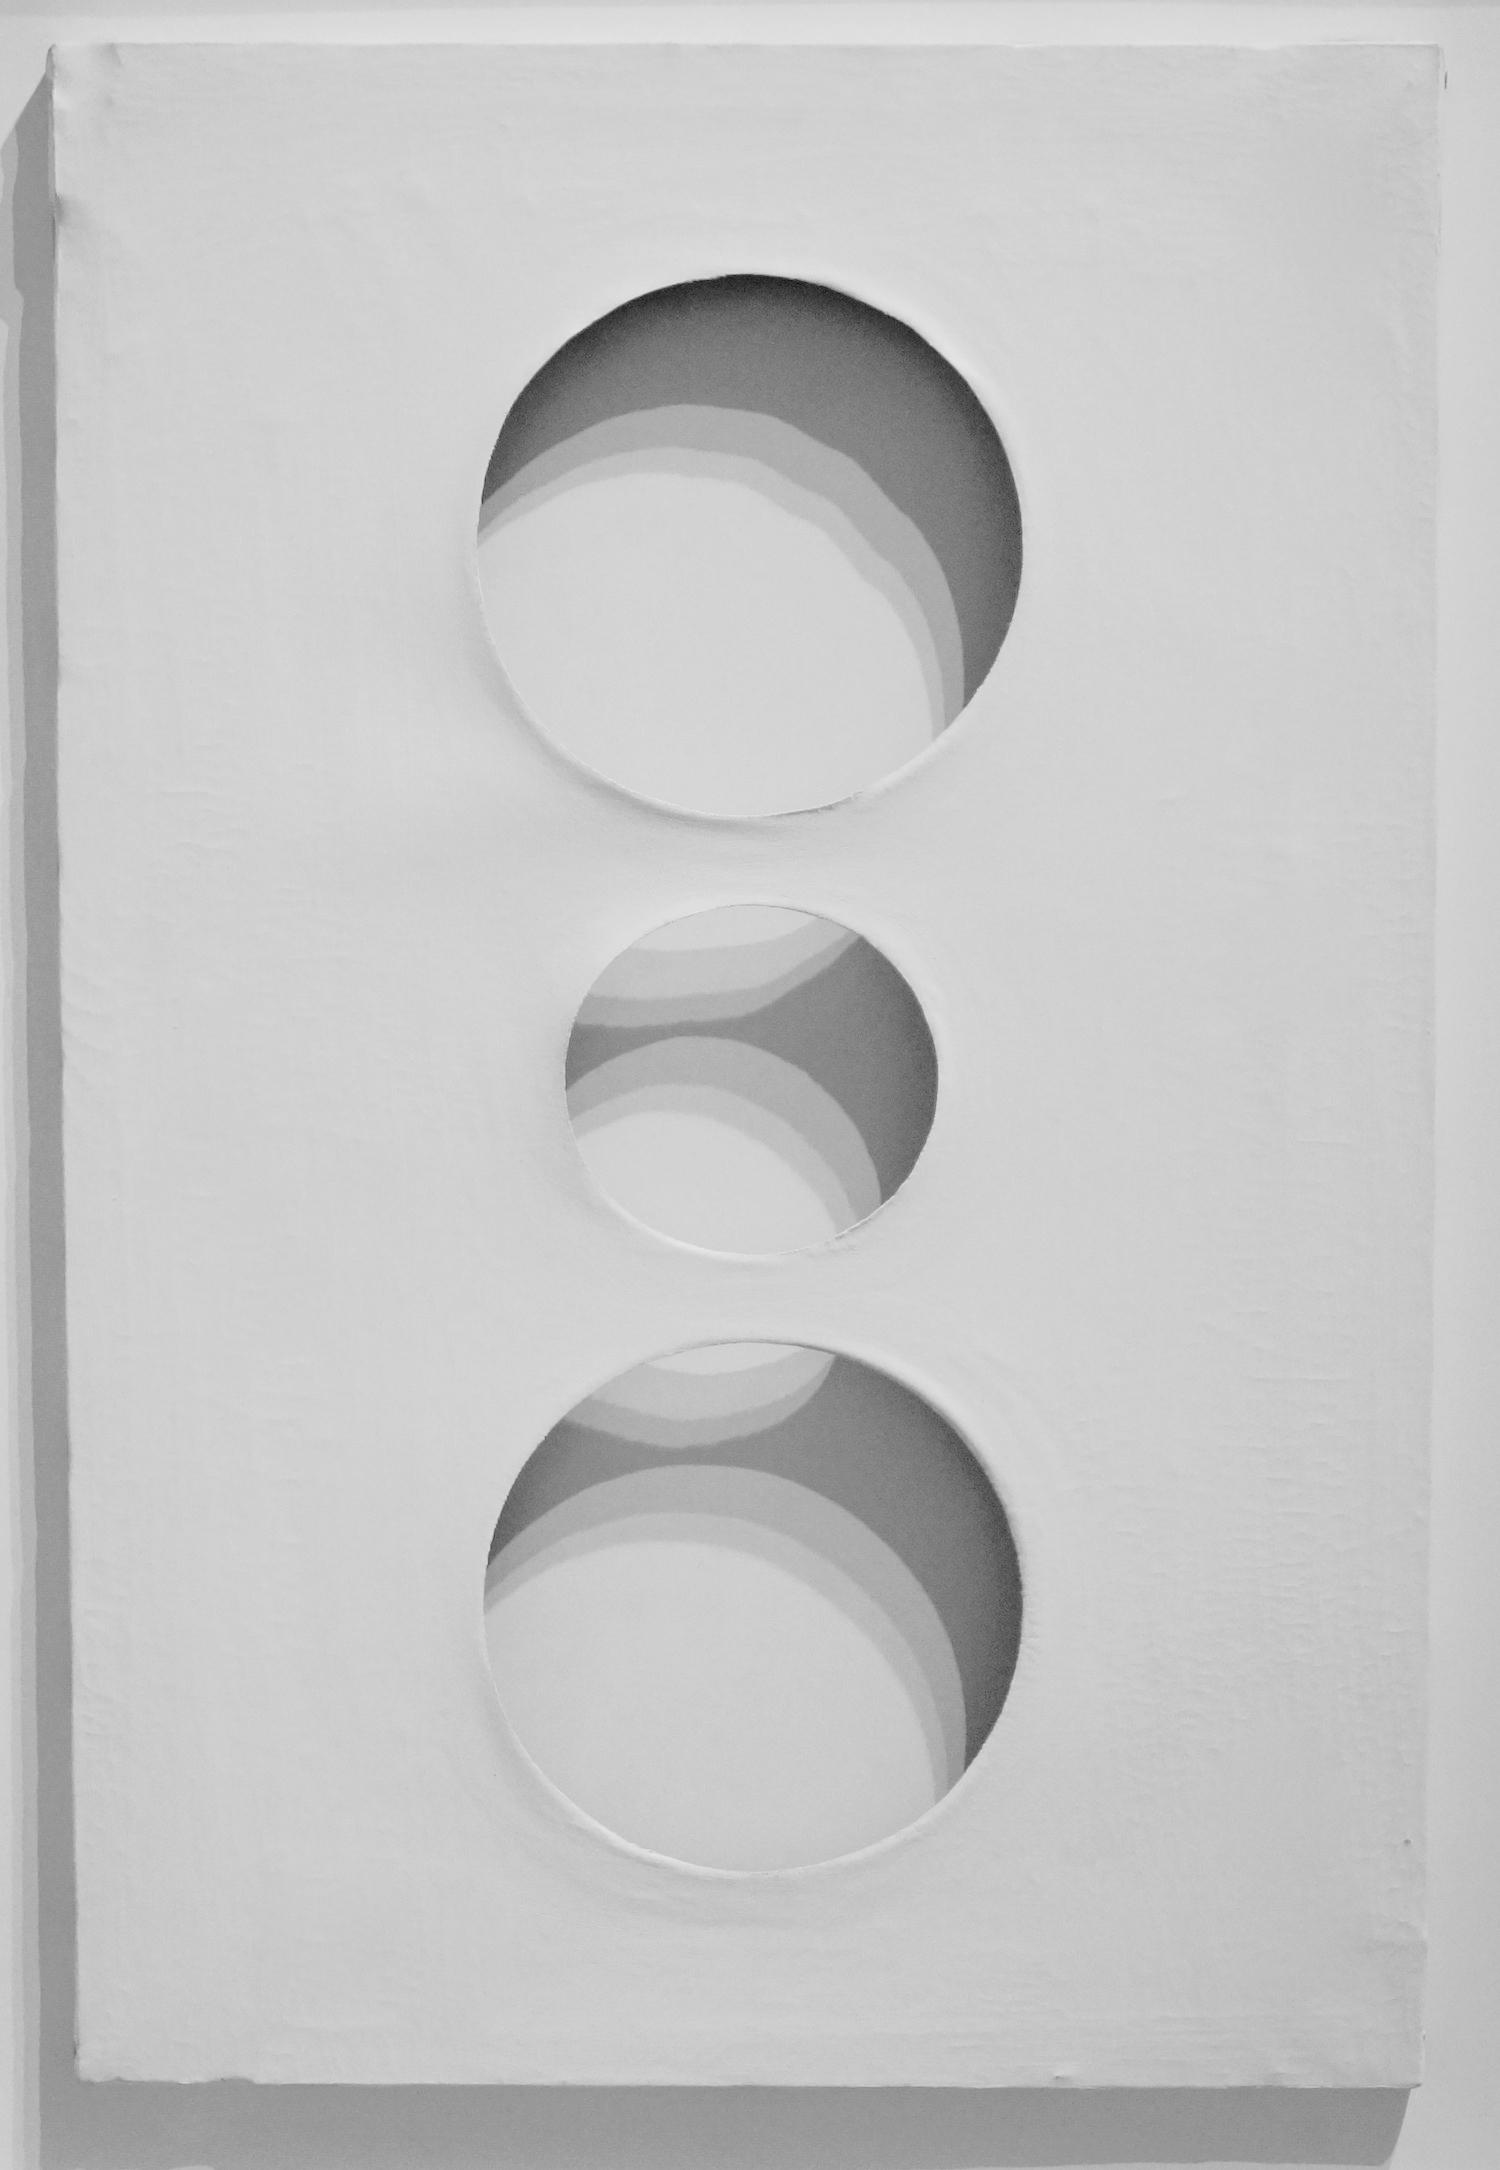 Dadamaino Volume bianco, 1960 Tempera on canvas 60 x 40 cm   23 2/3 x 15 3/4 in